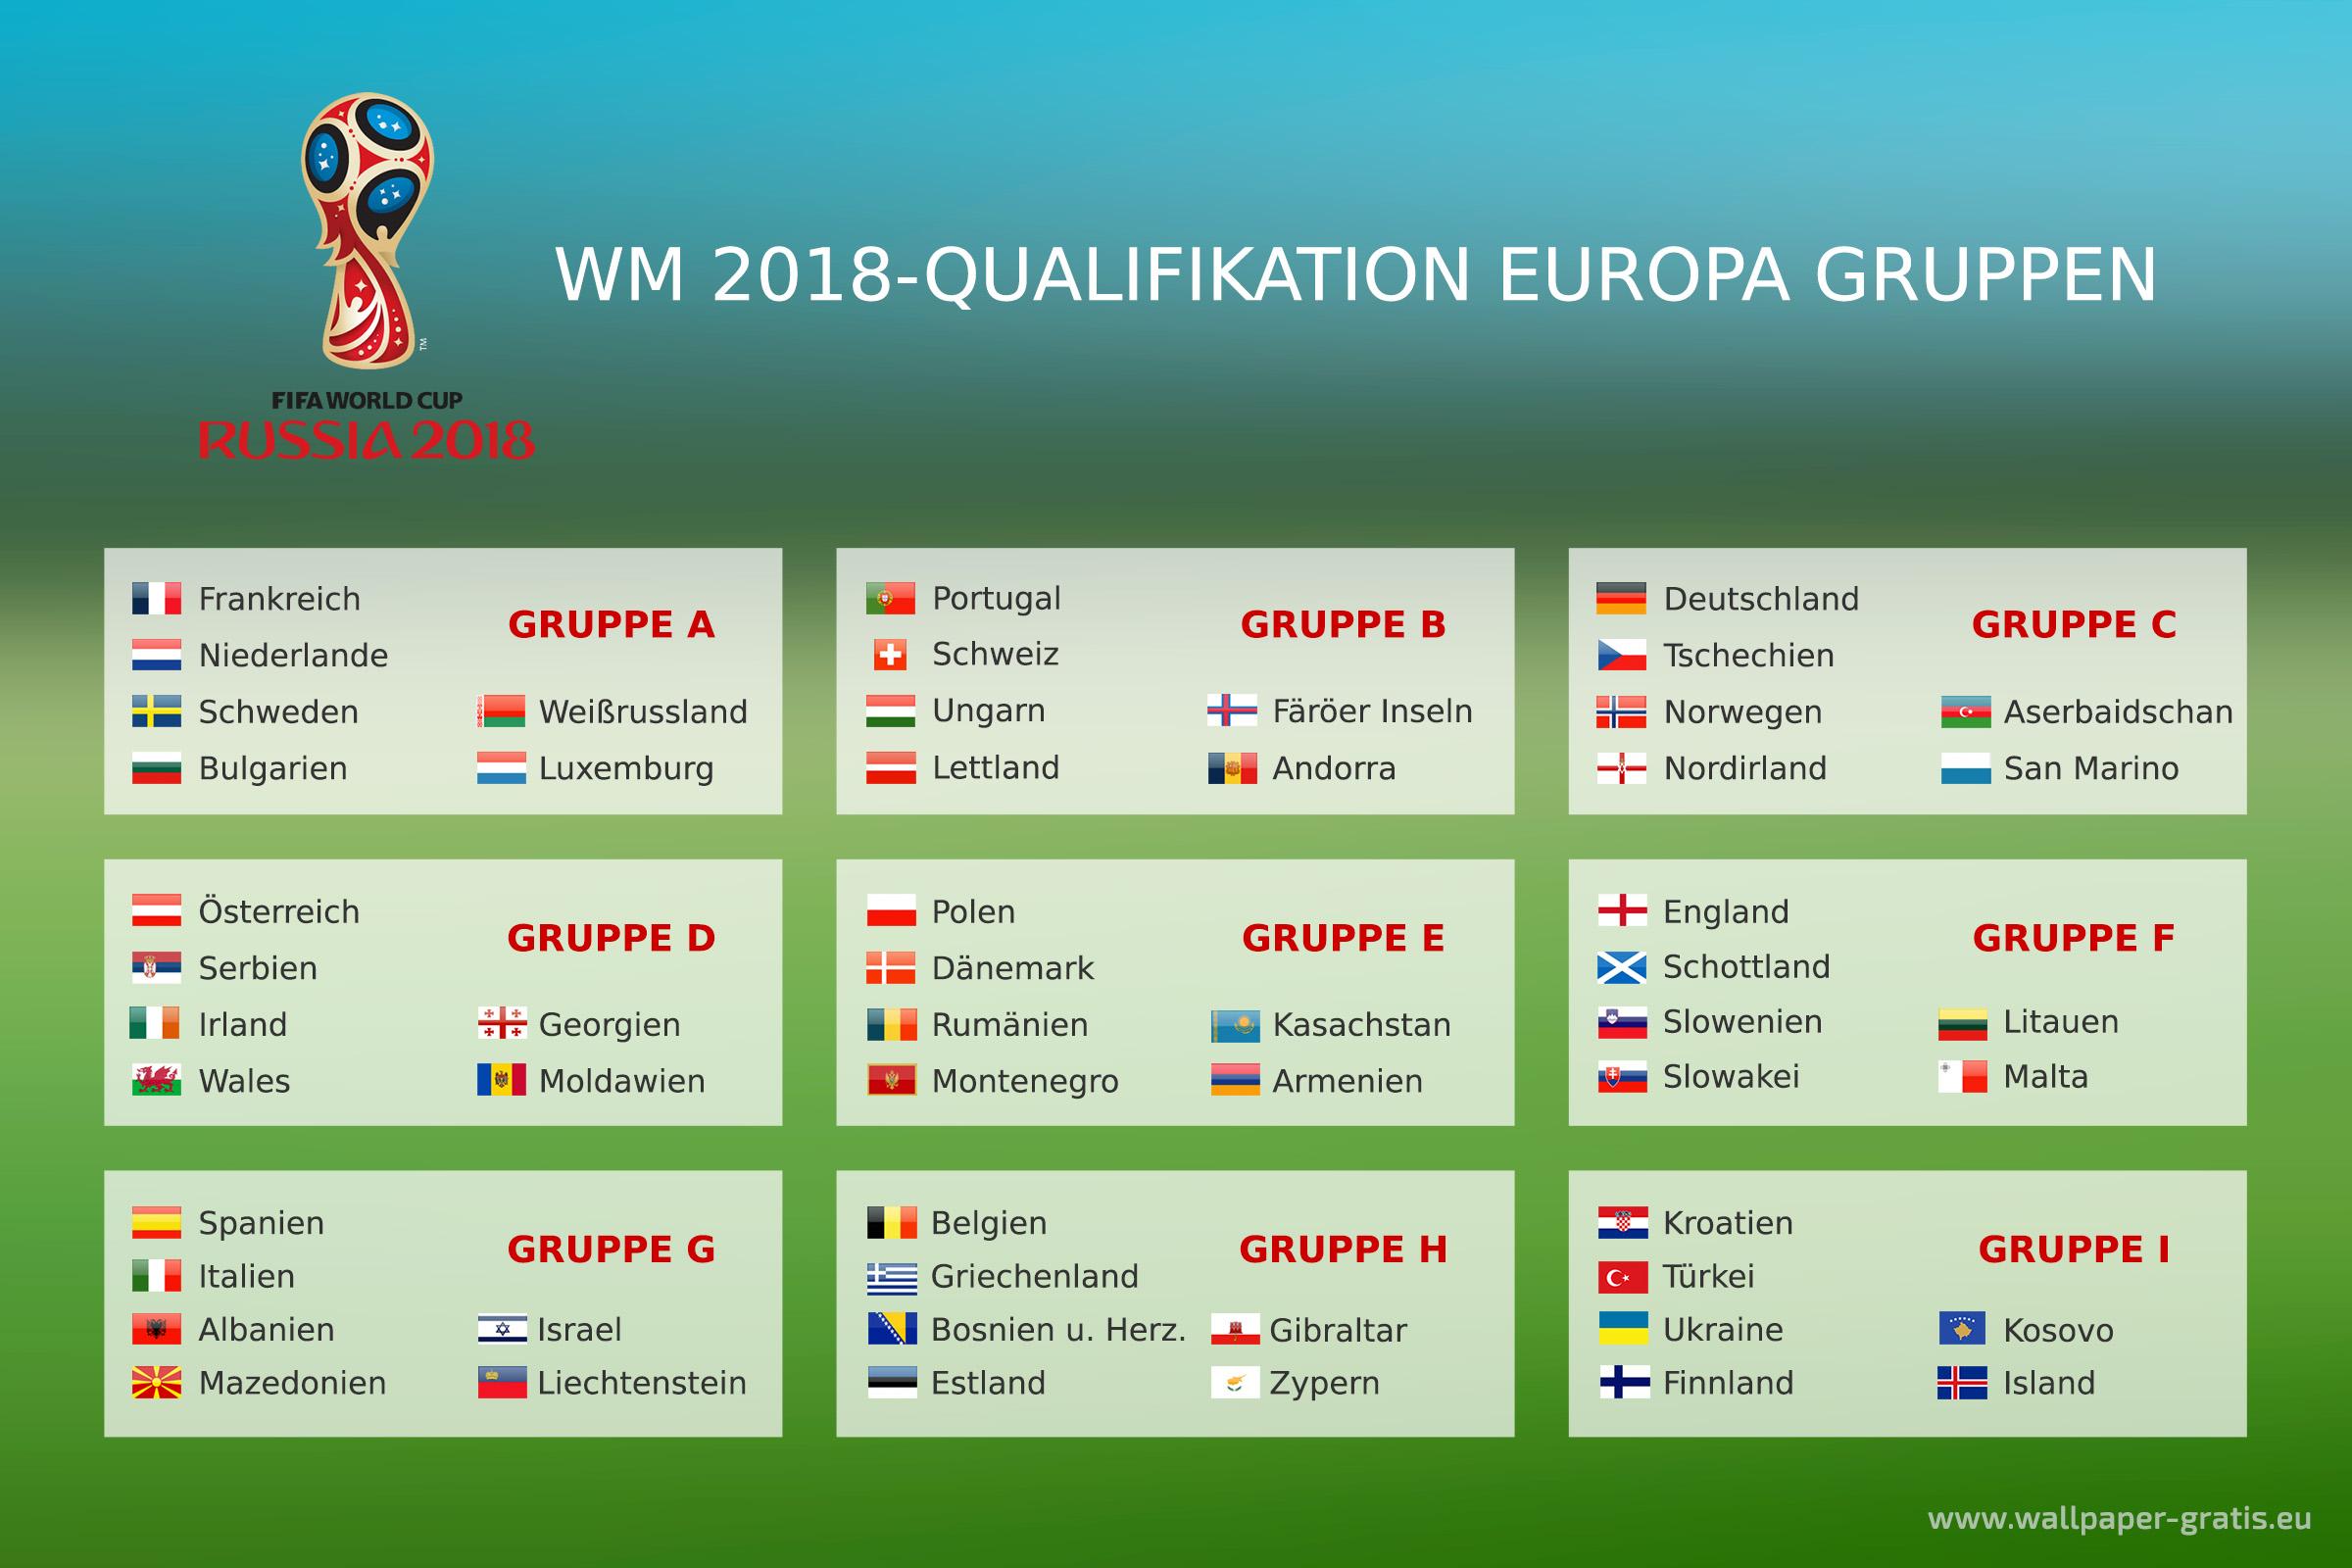 fußball europa qualifikation